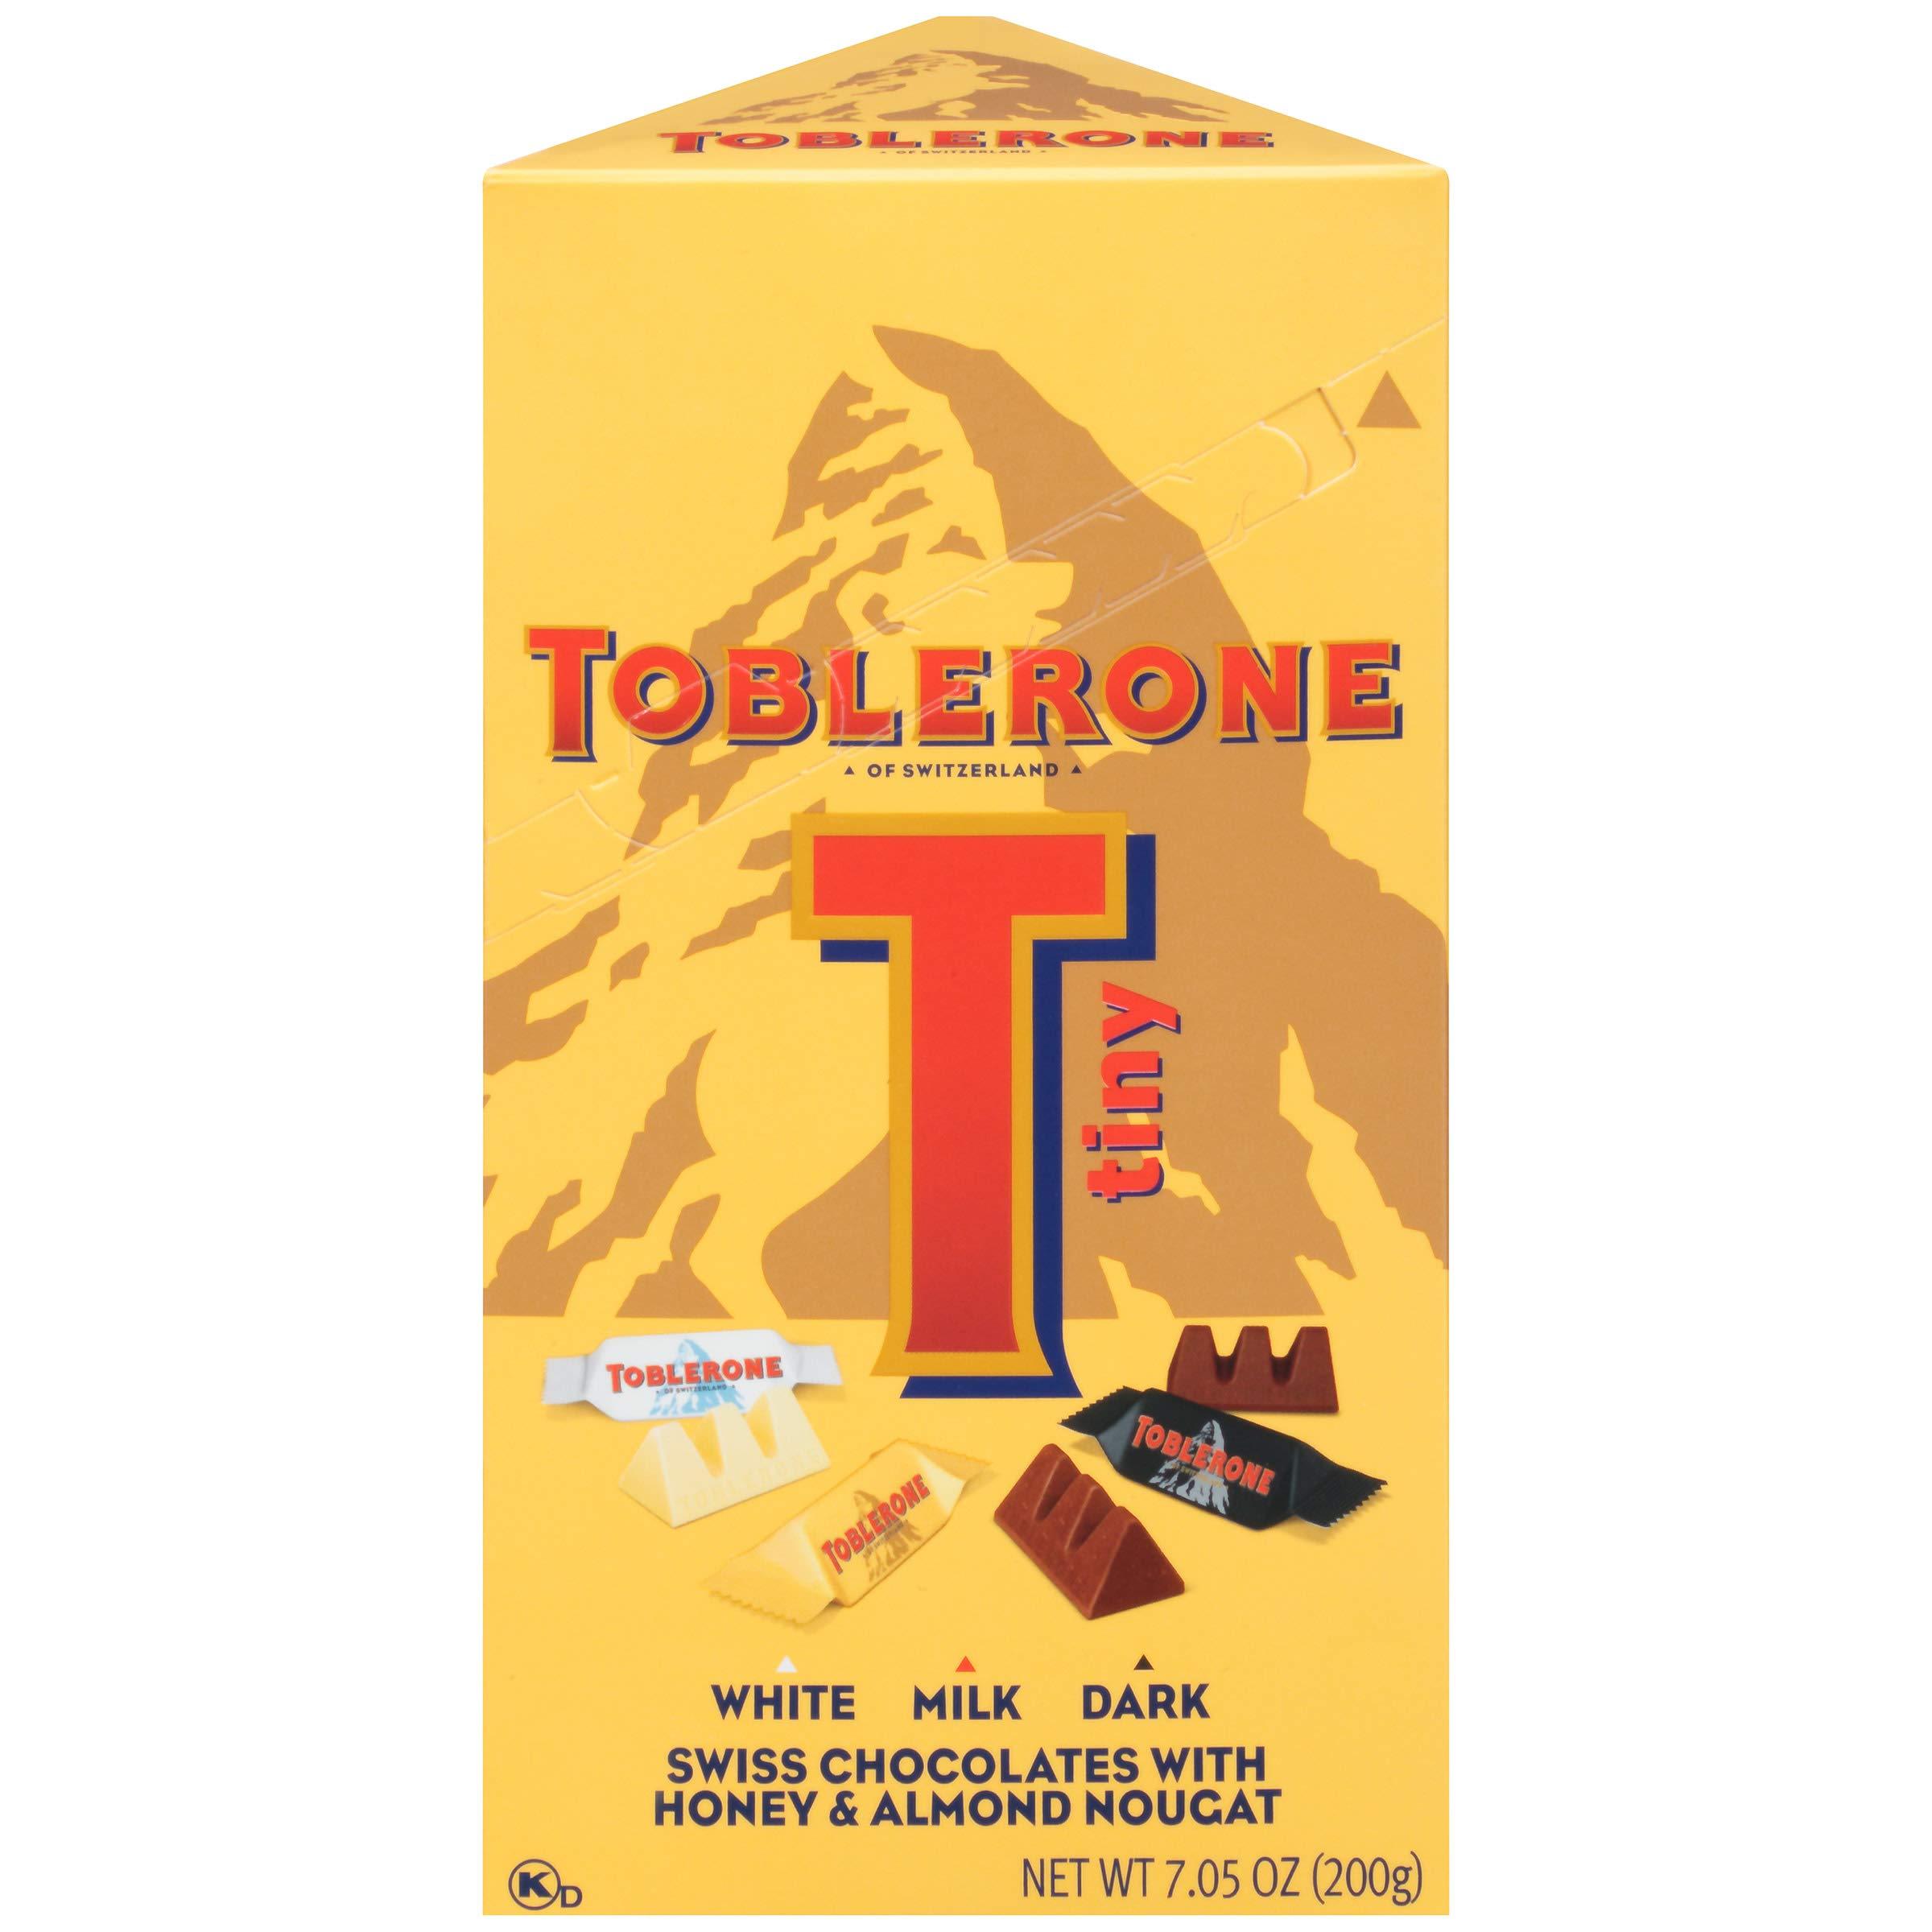 Toblerone Tiny Swiss Chocolates with Honey & Almond Nougat Variety Pack, White Chocolate, Milk Chocolate and Dark Chocolate Box, White / Dark, 75 Oz